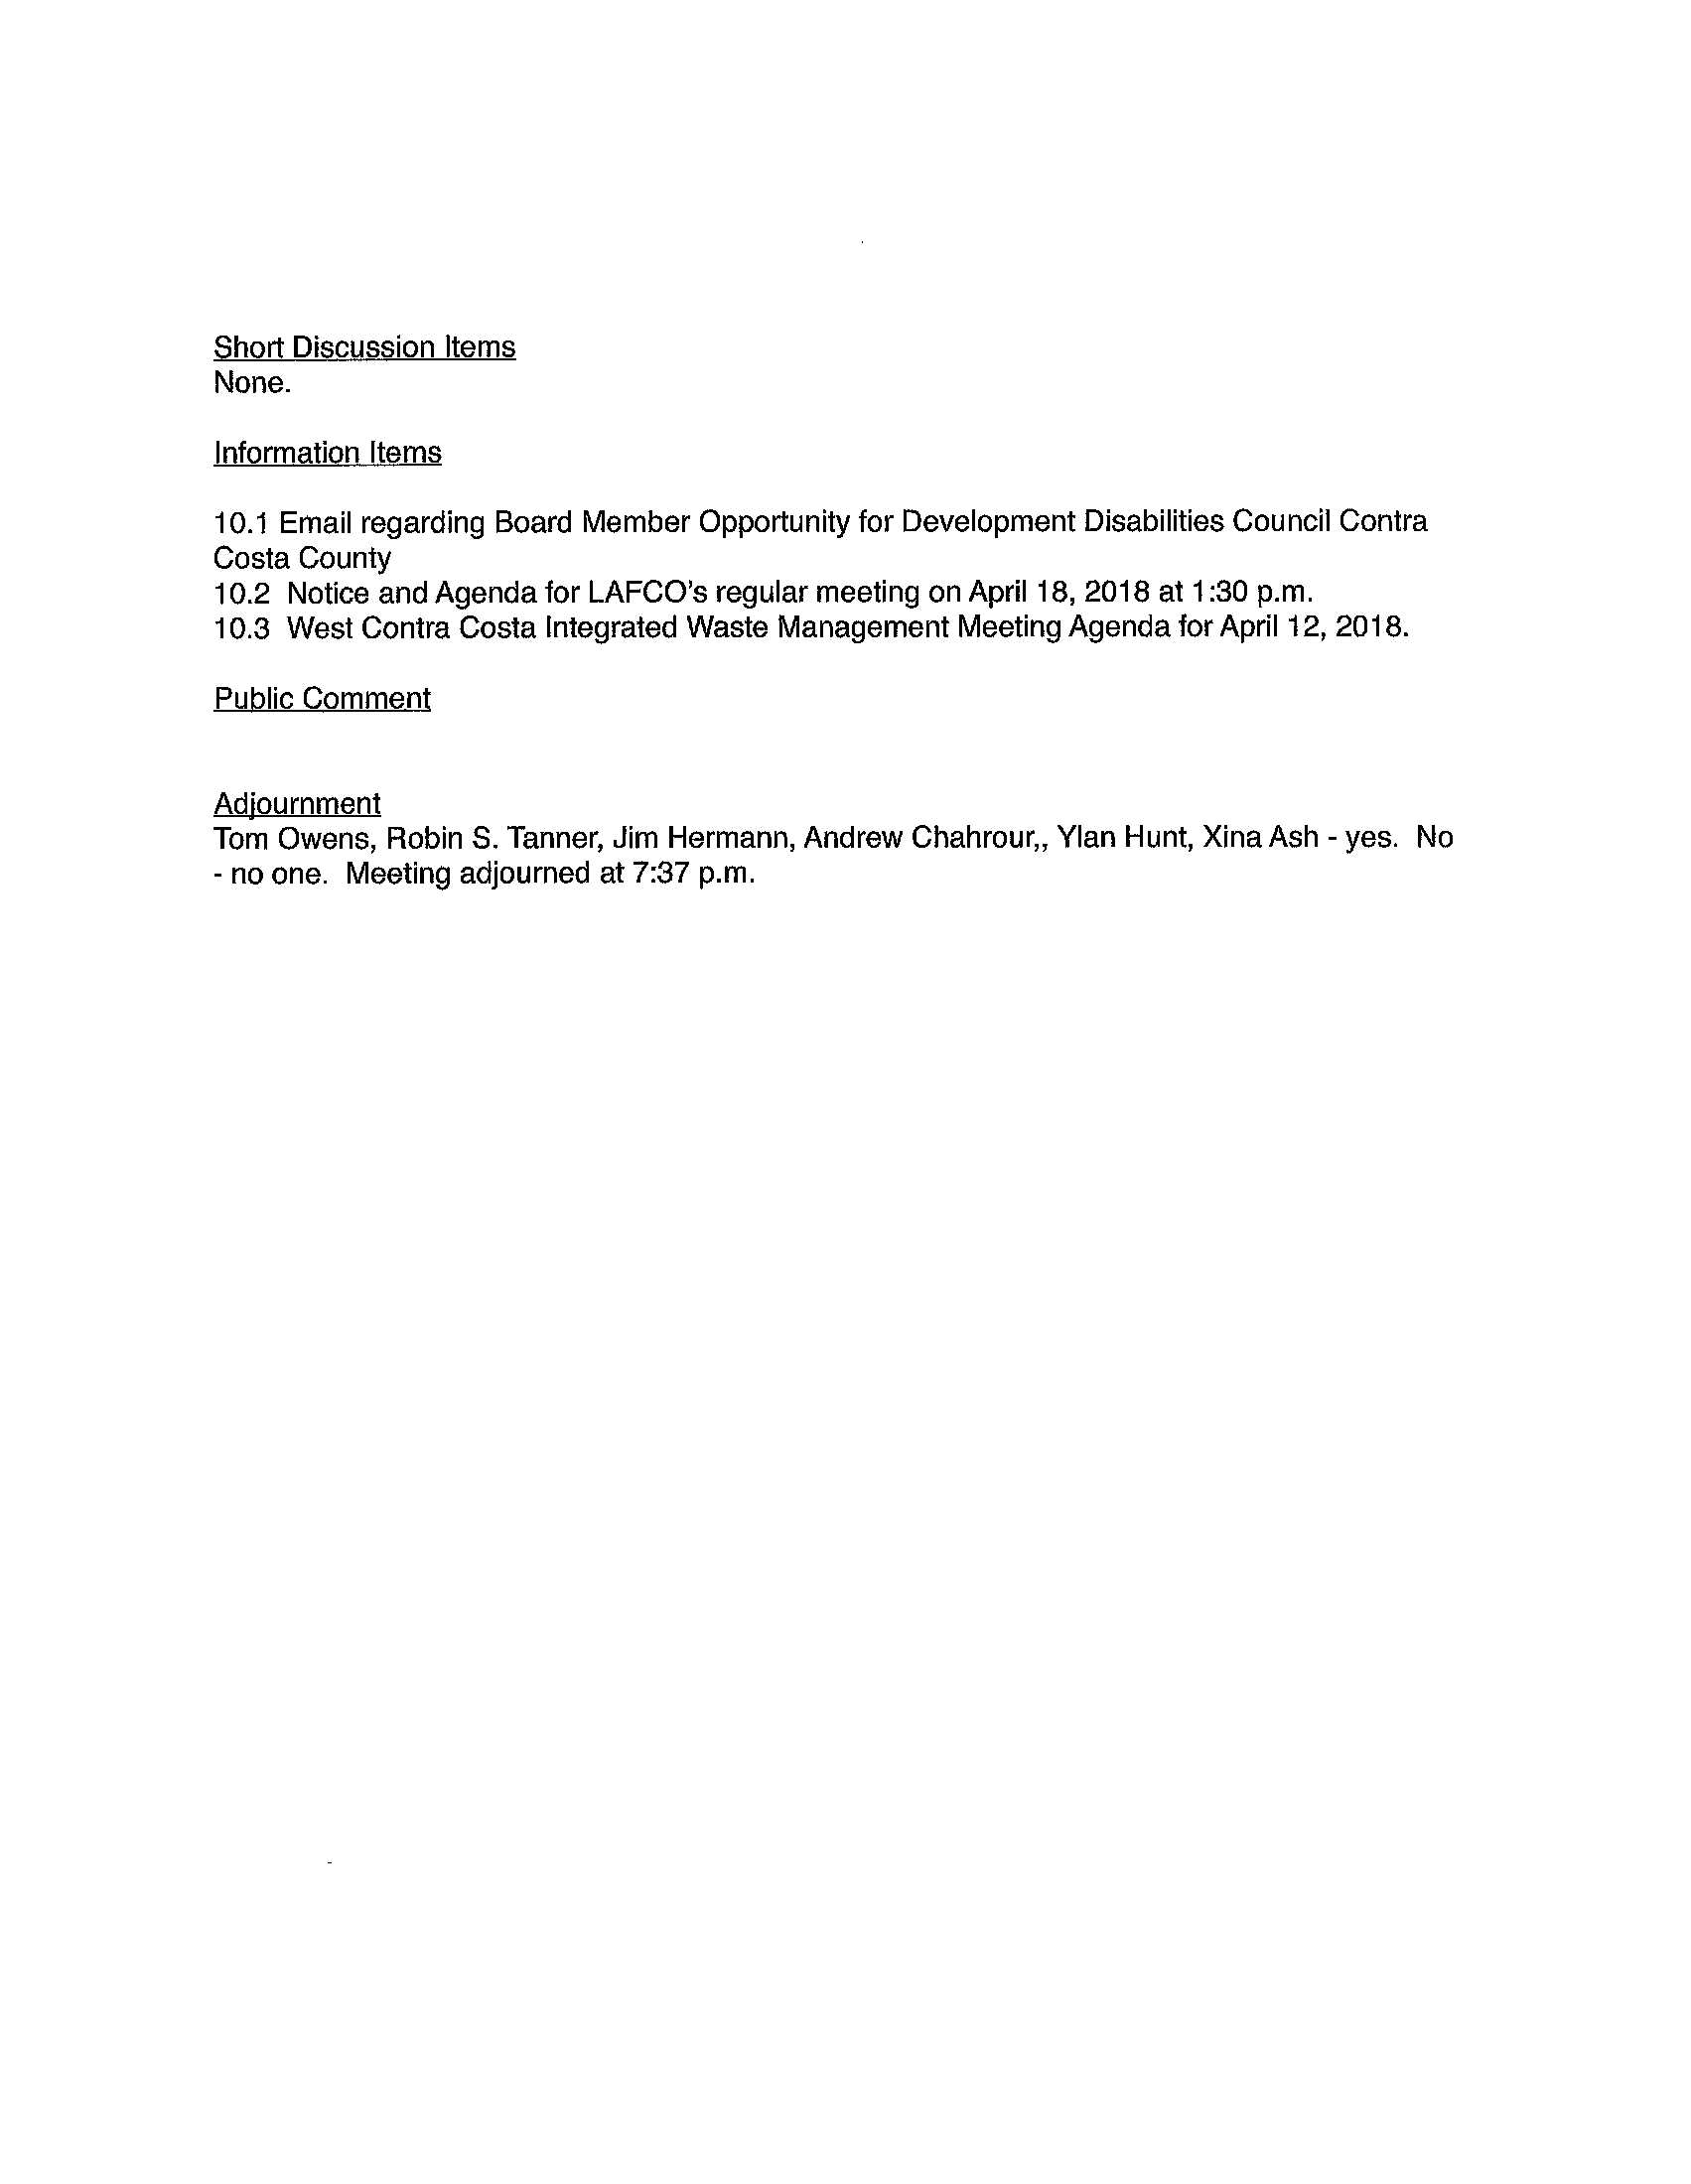 ESMAC Agenda 7.11.2018 (36 Pages)_4.jpg